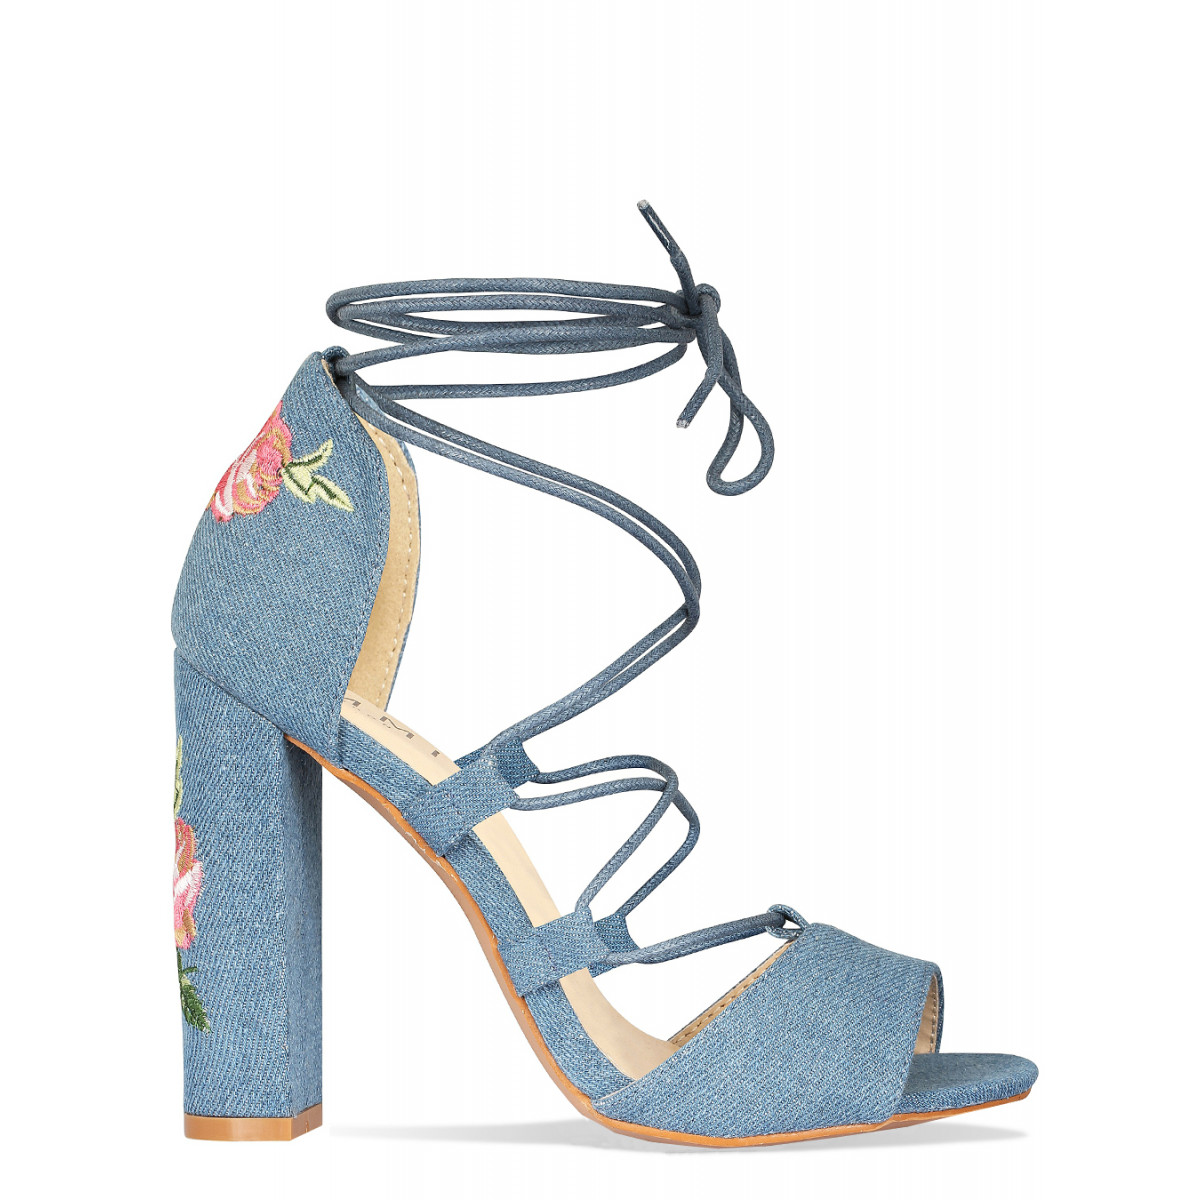 Reina Denim Floral Lace Up Heels : Simmi Shoes